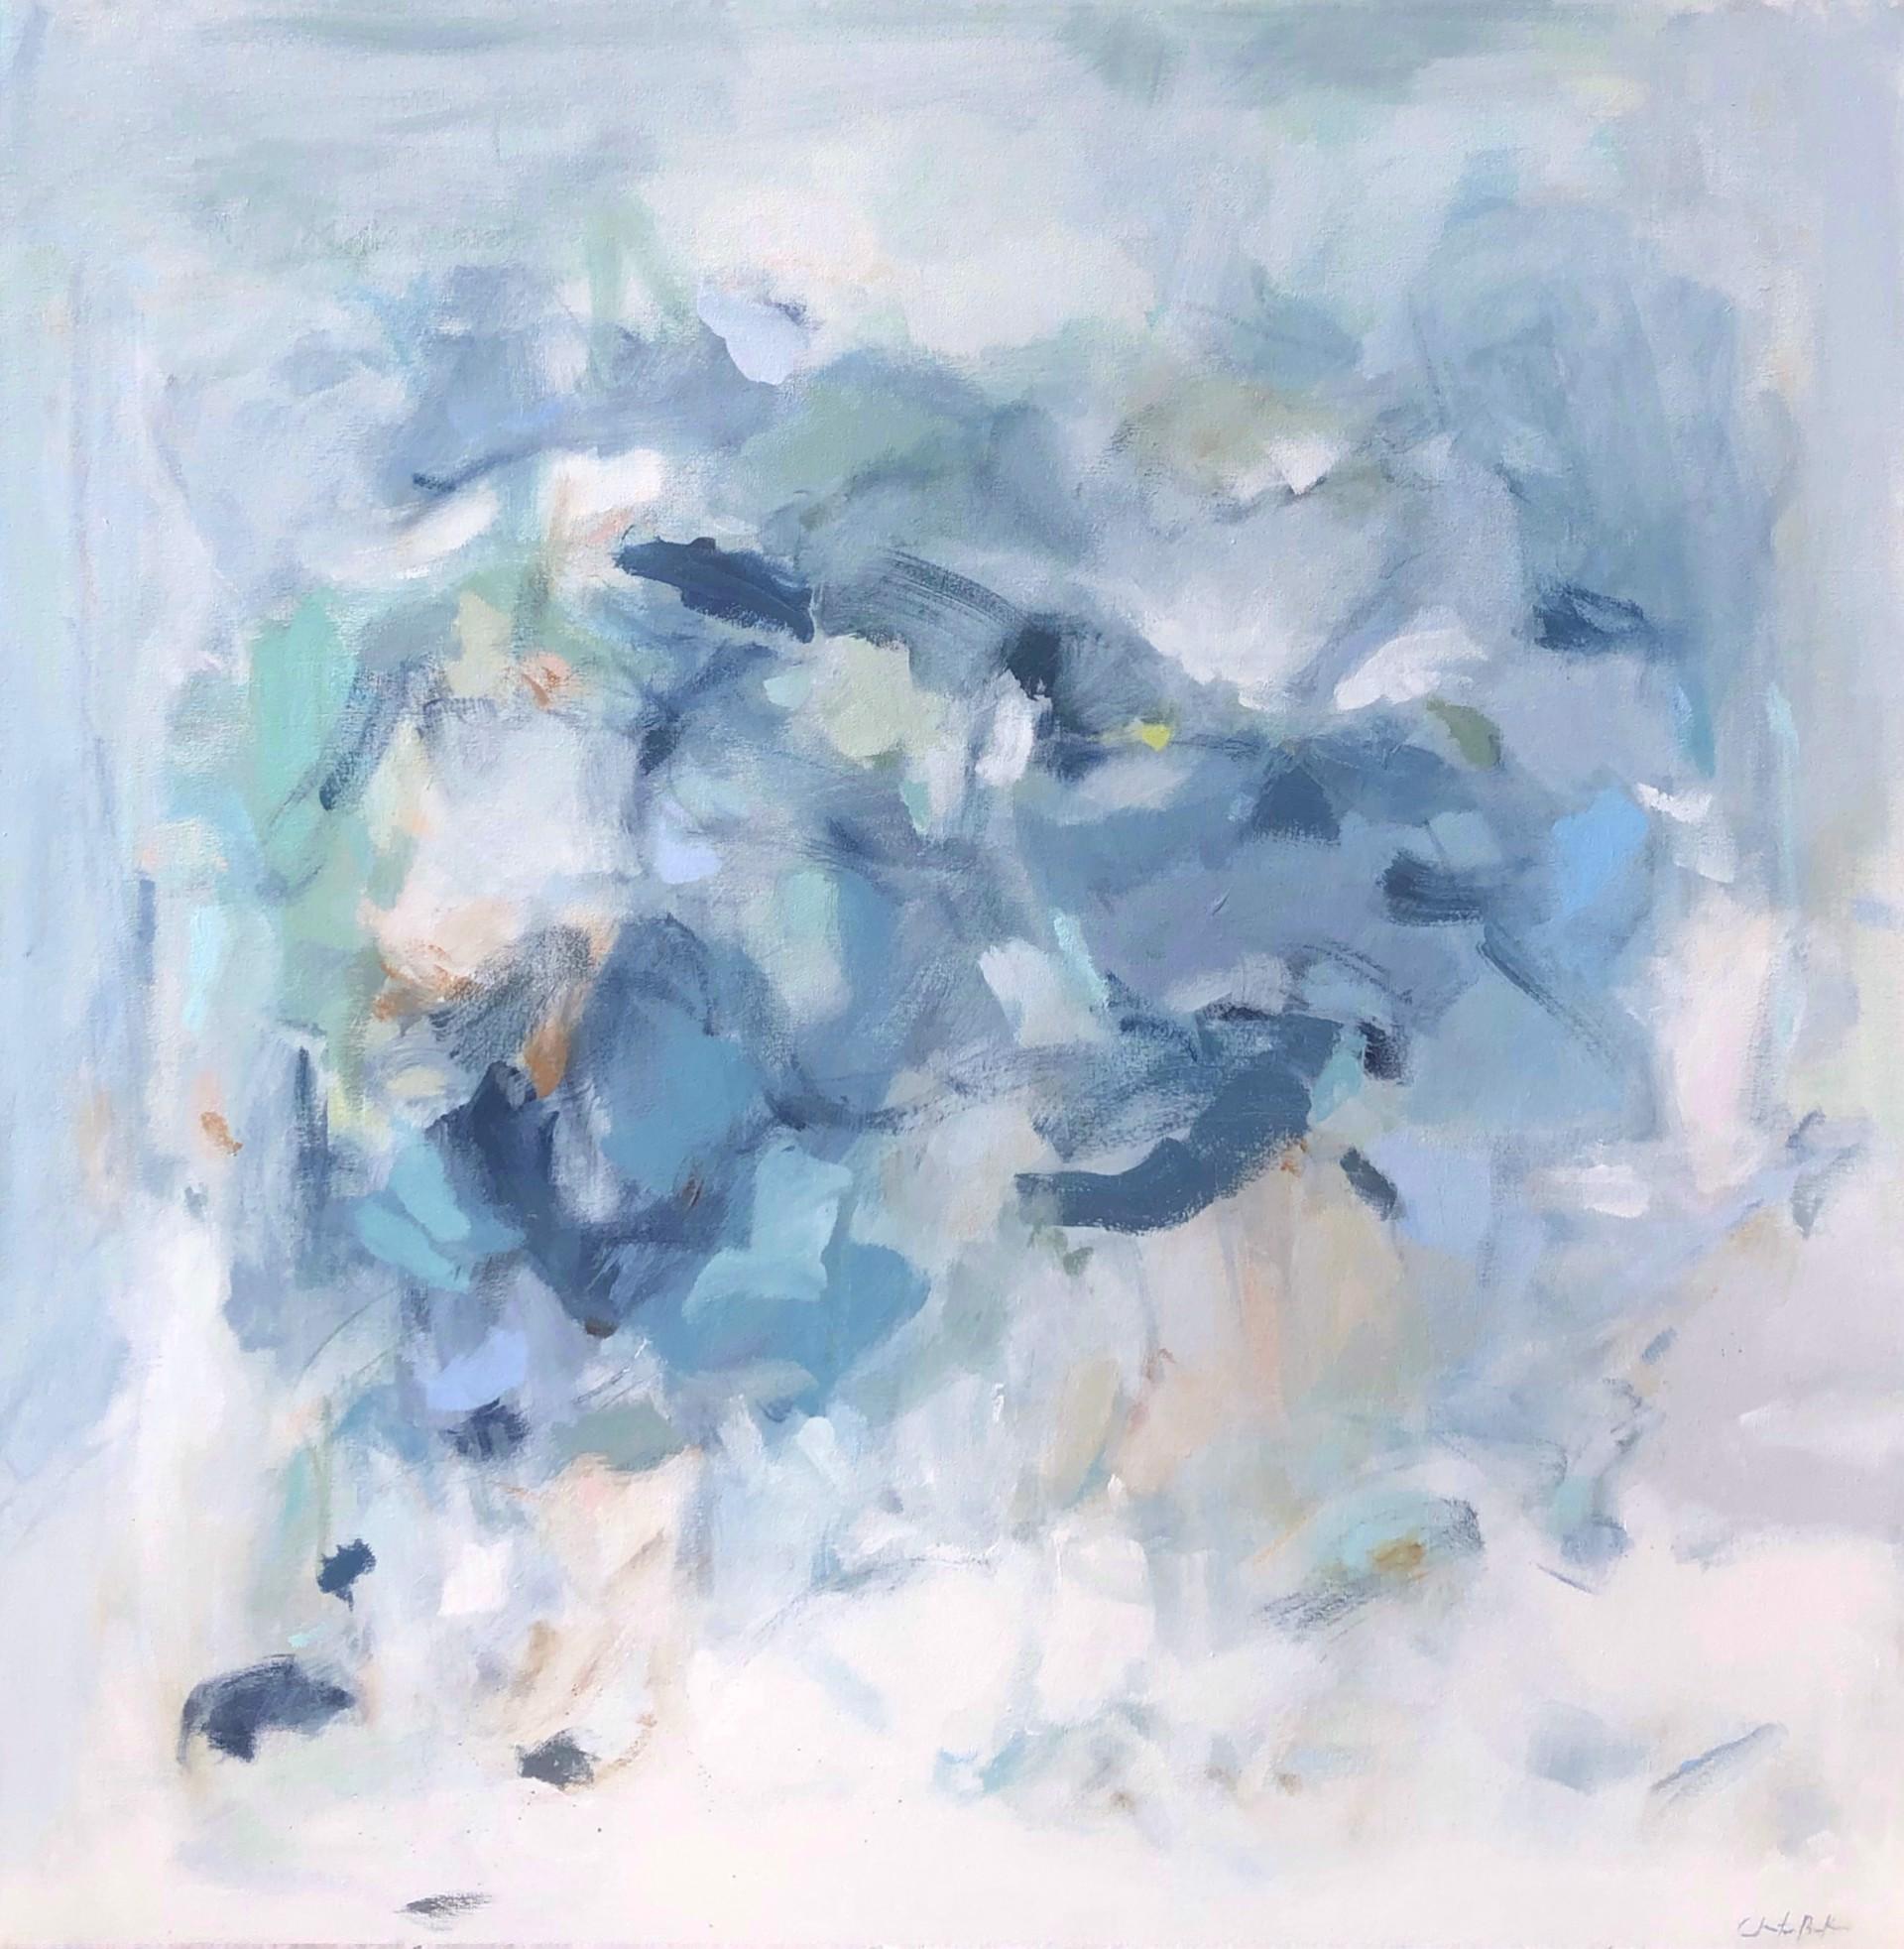 Stardust 2 by Christina Baker